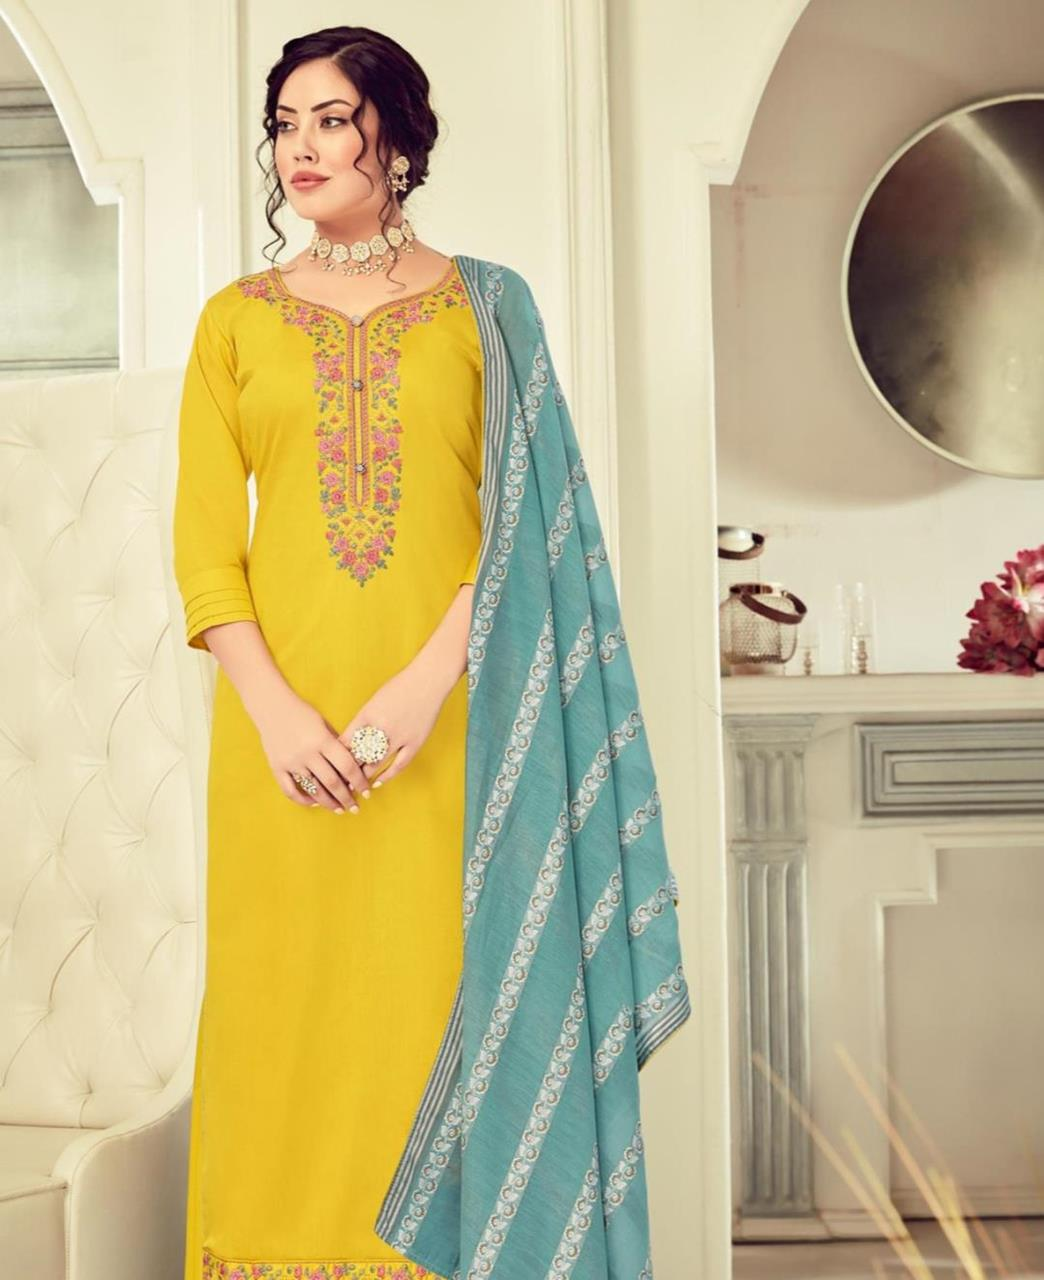 HandWorked Cotton Straight cut Salwar Kameez in Lemon Yellow